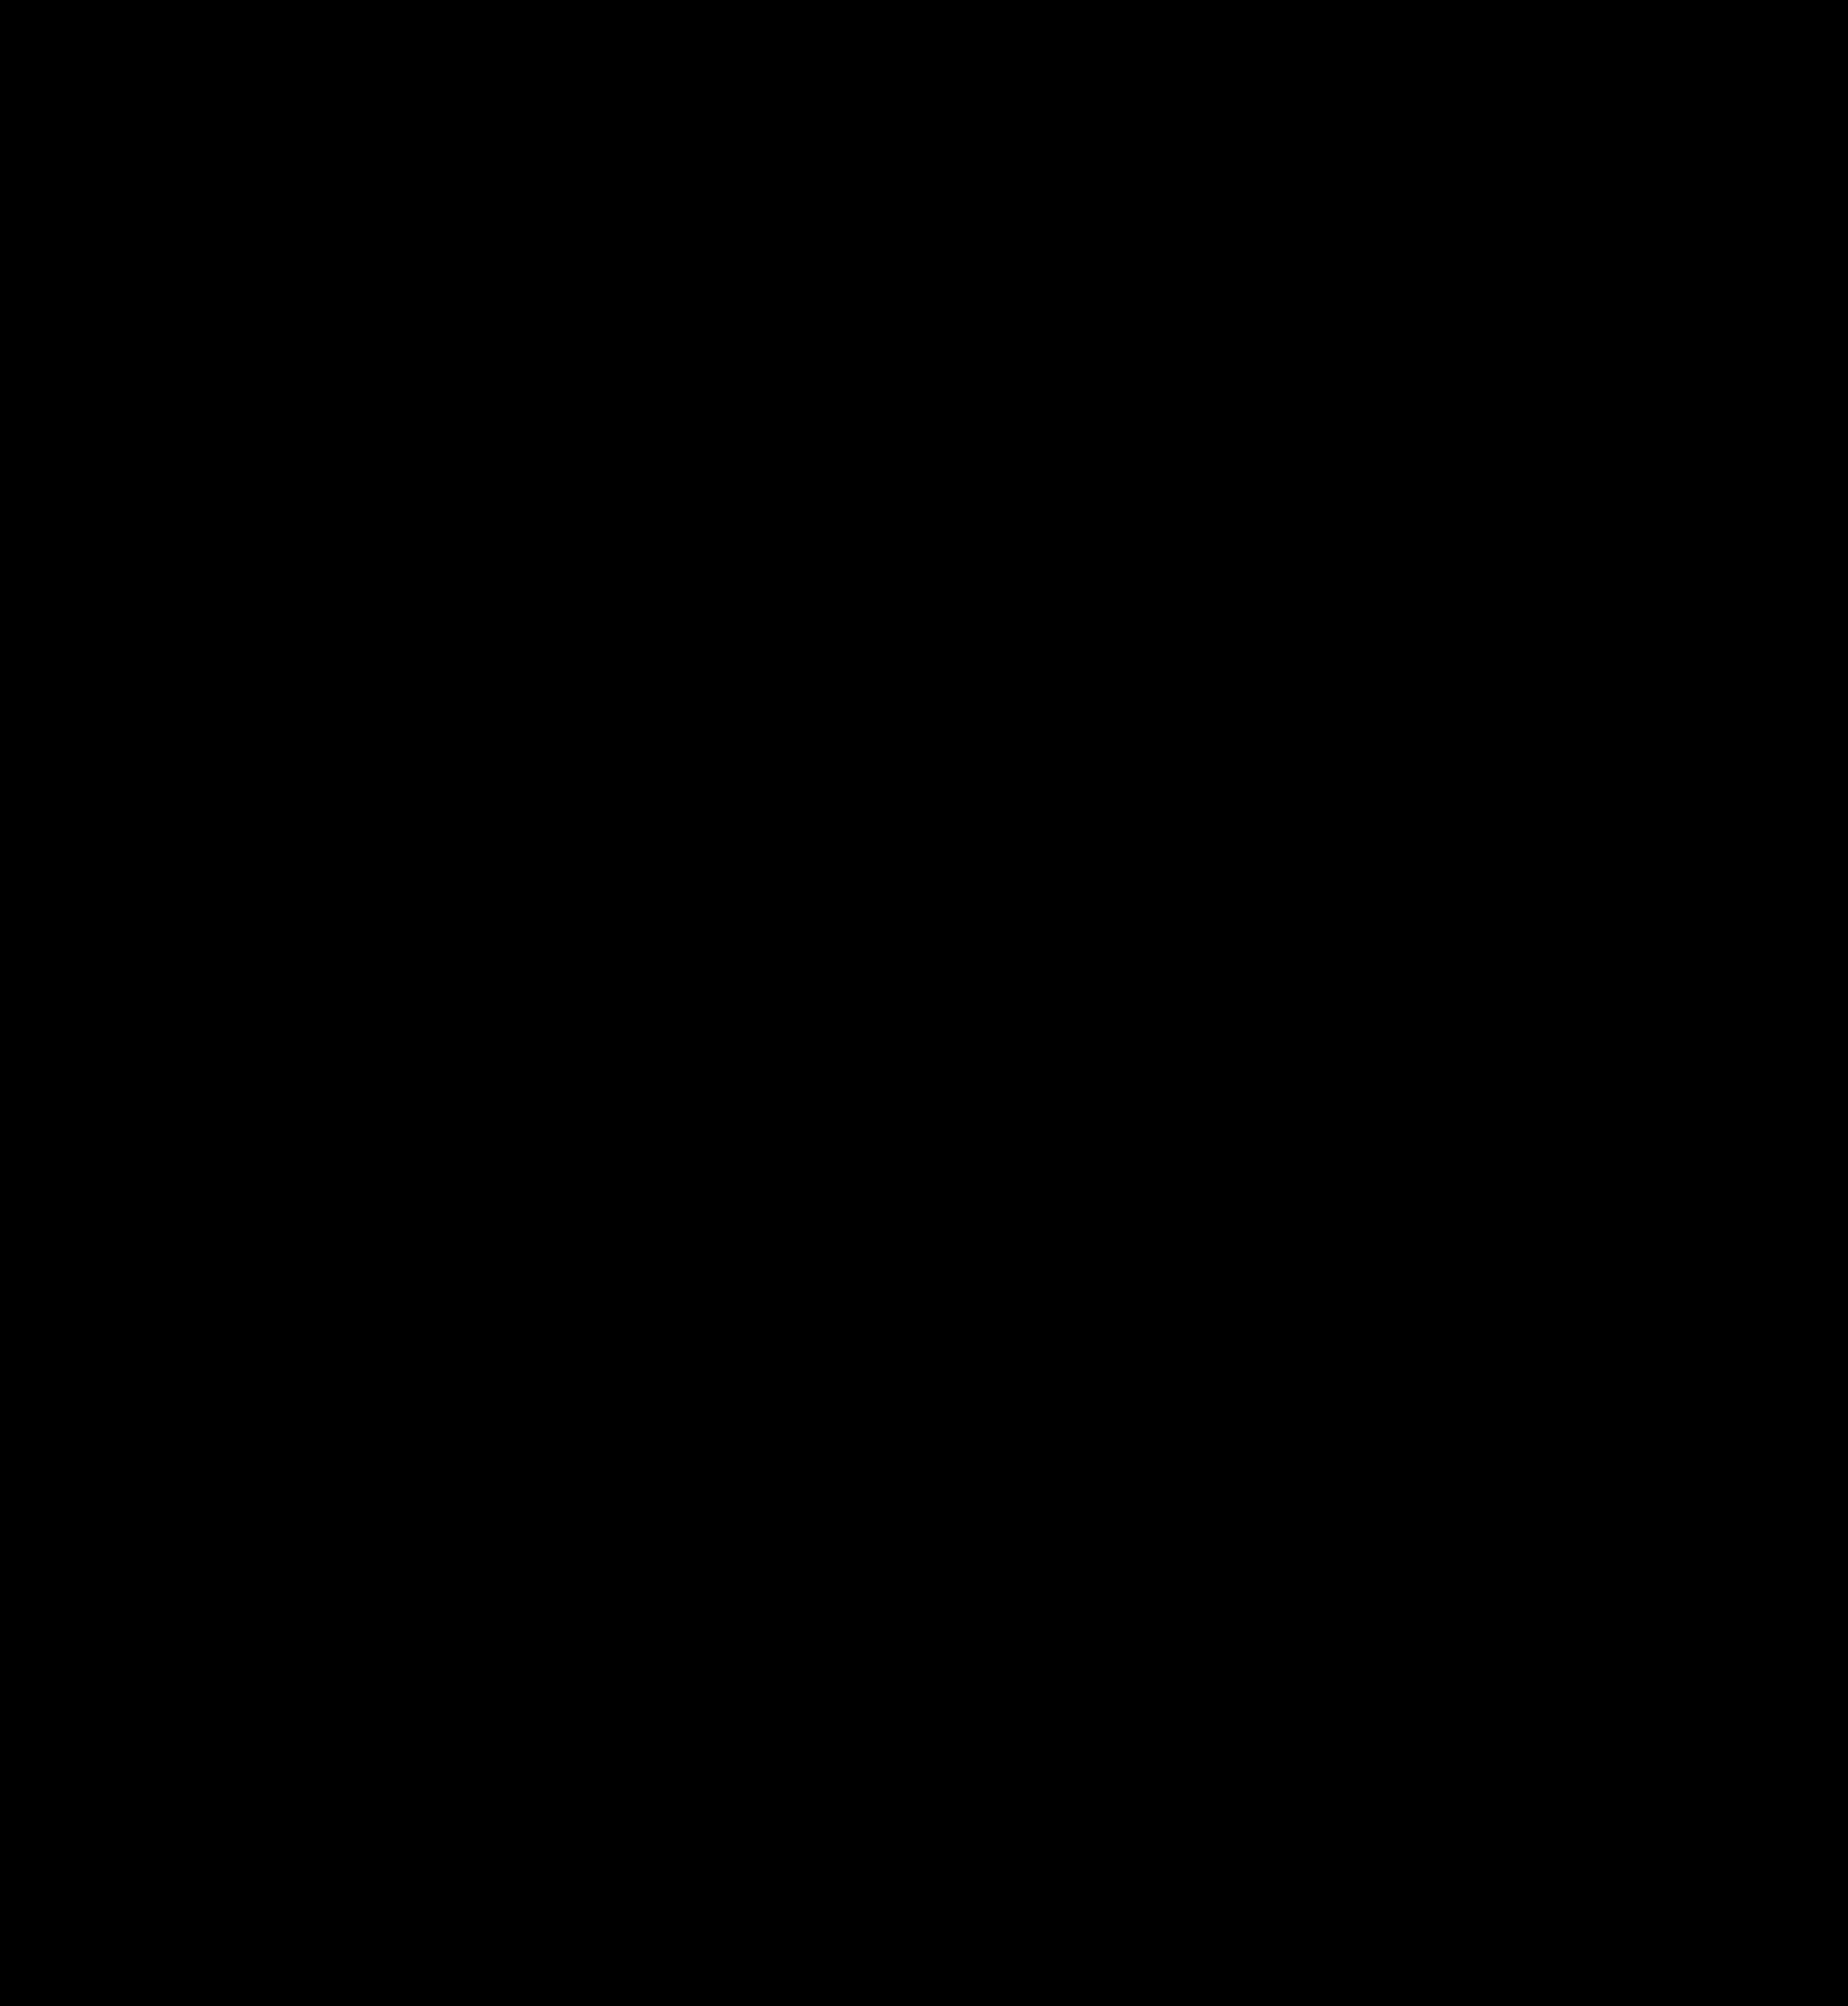 MRPC_Primary Logo_Black.png